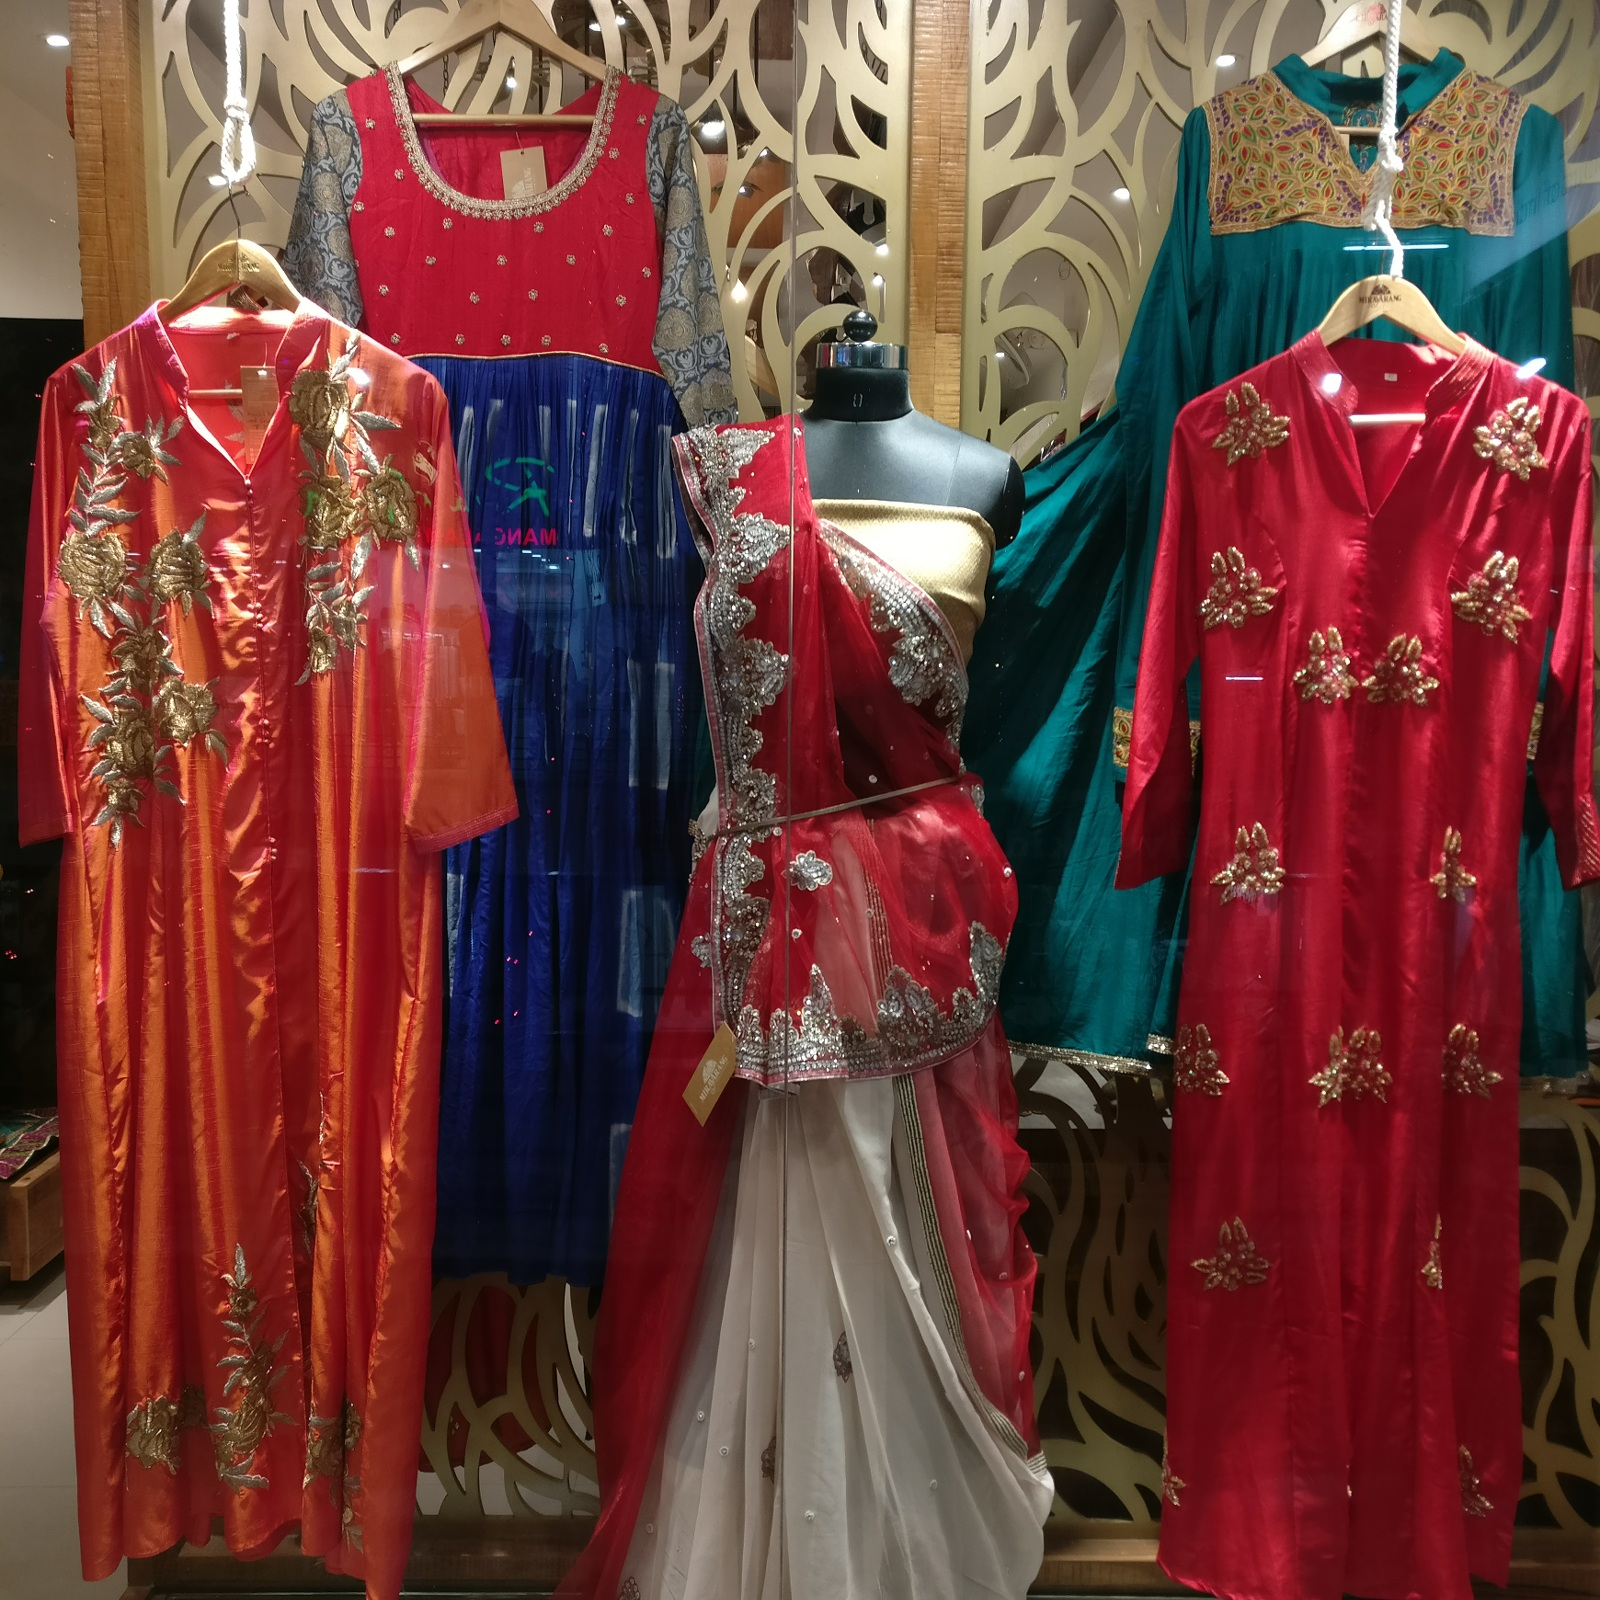 Premium High Fashion Ladies Clothing Store for Sale in Vadodara.